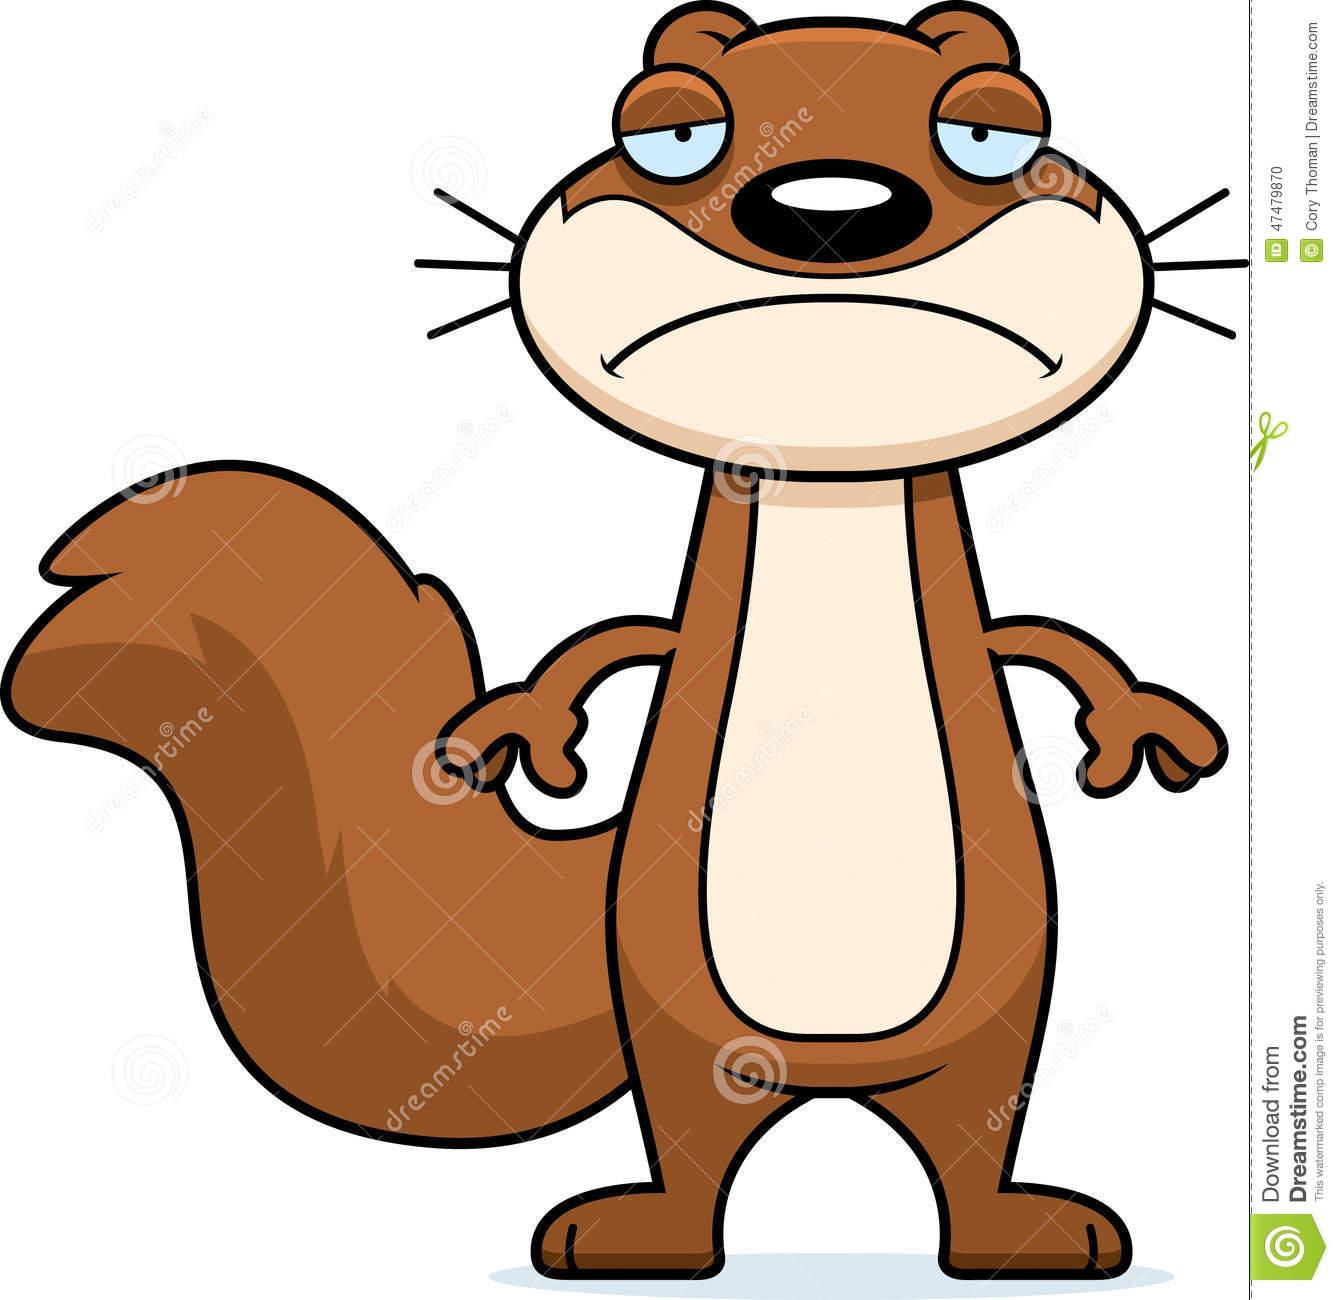 1339x1300 Squirrel Clip Art Squirrel Vector Clip Art